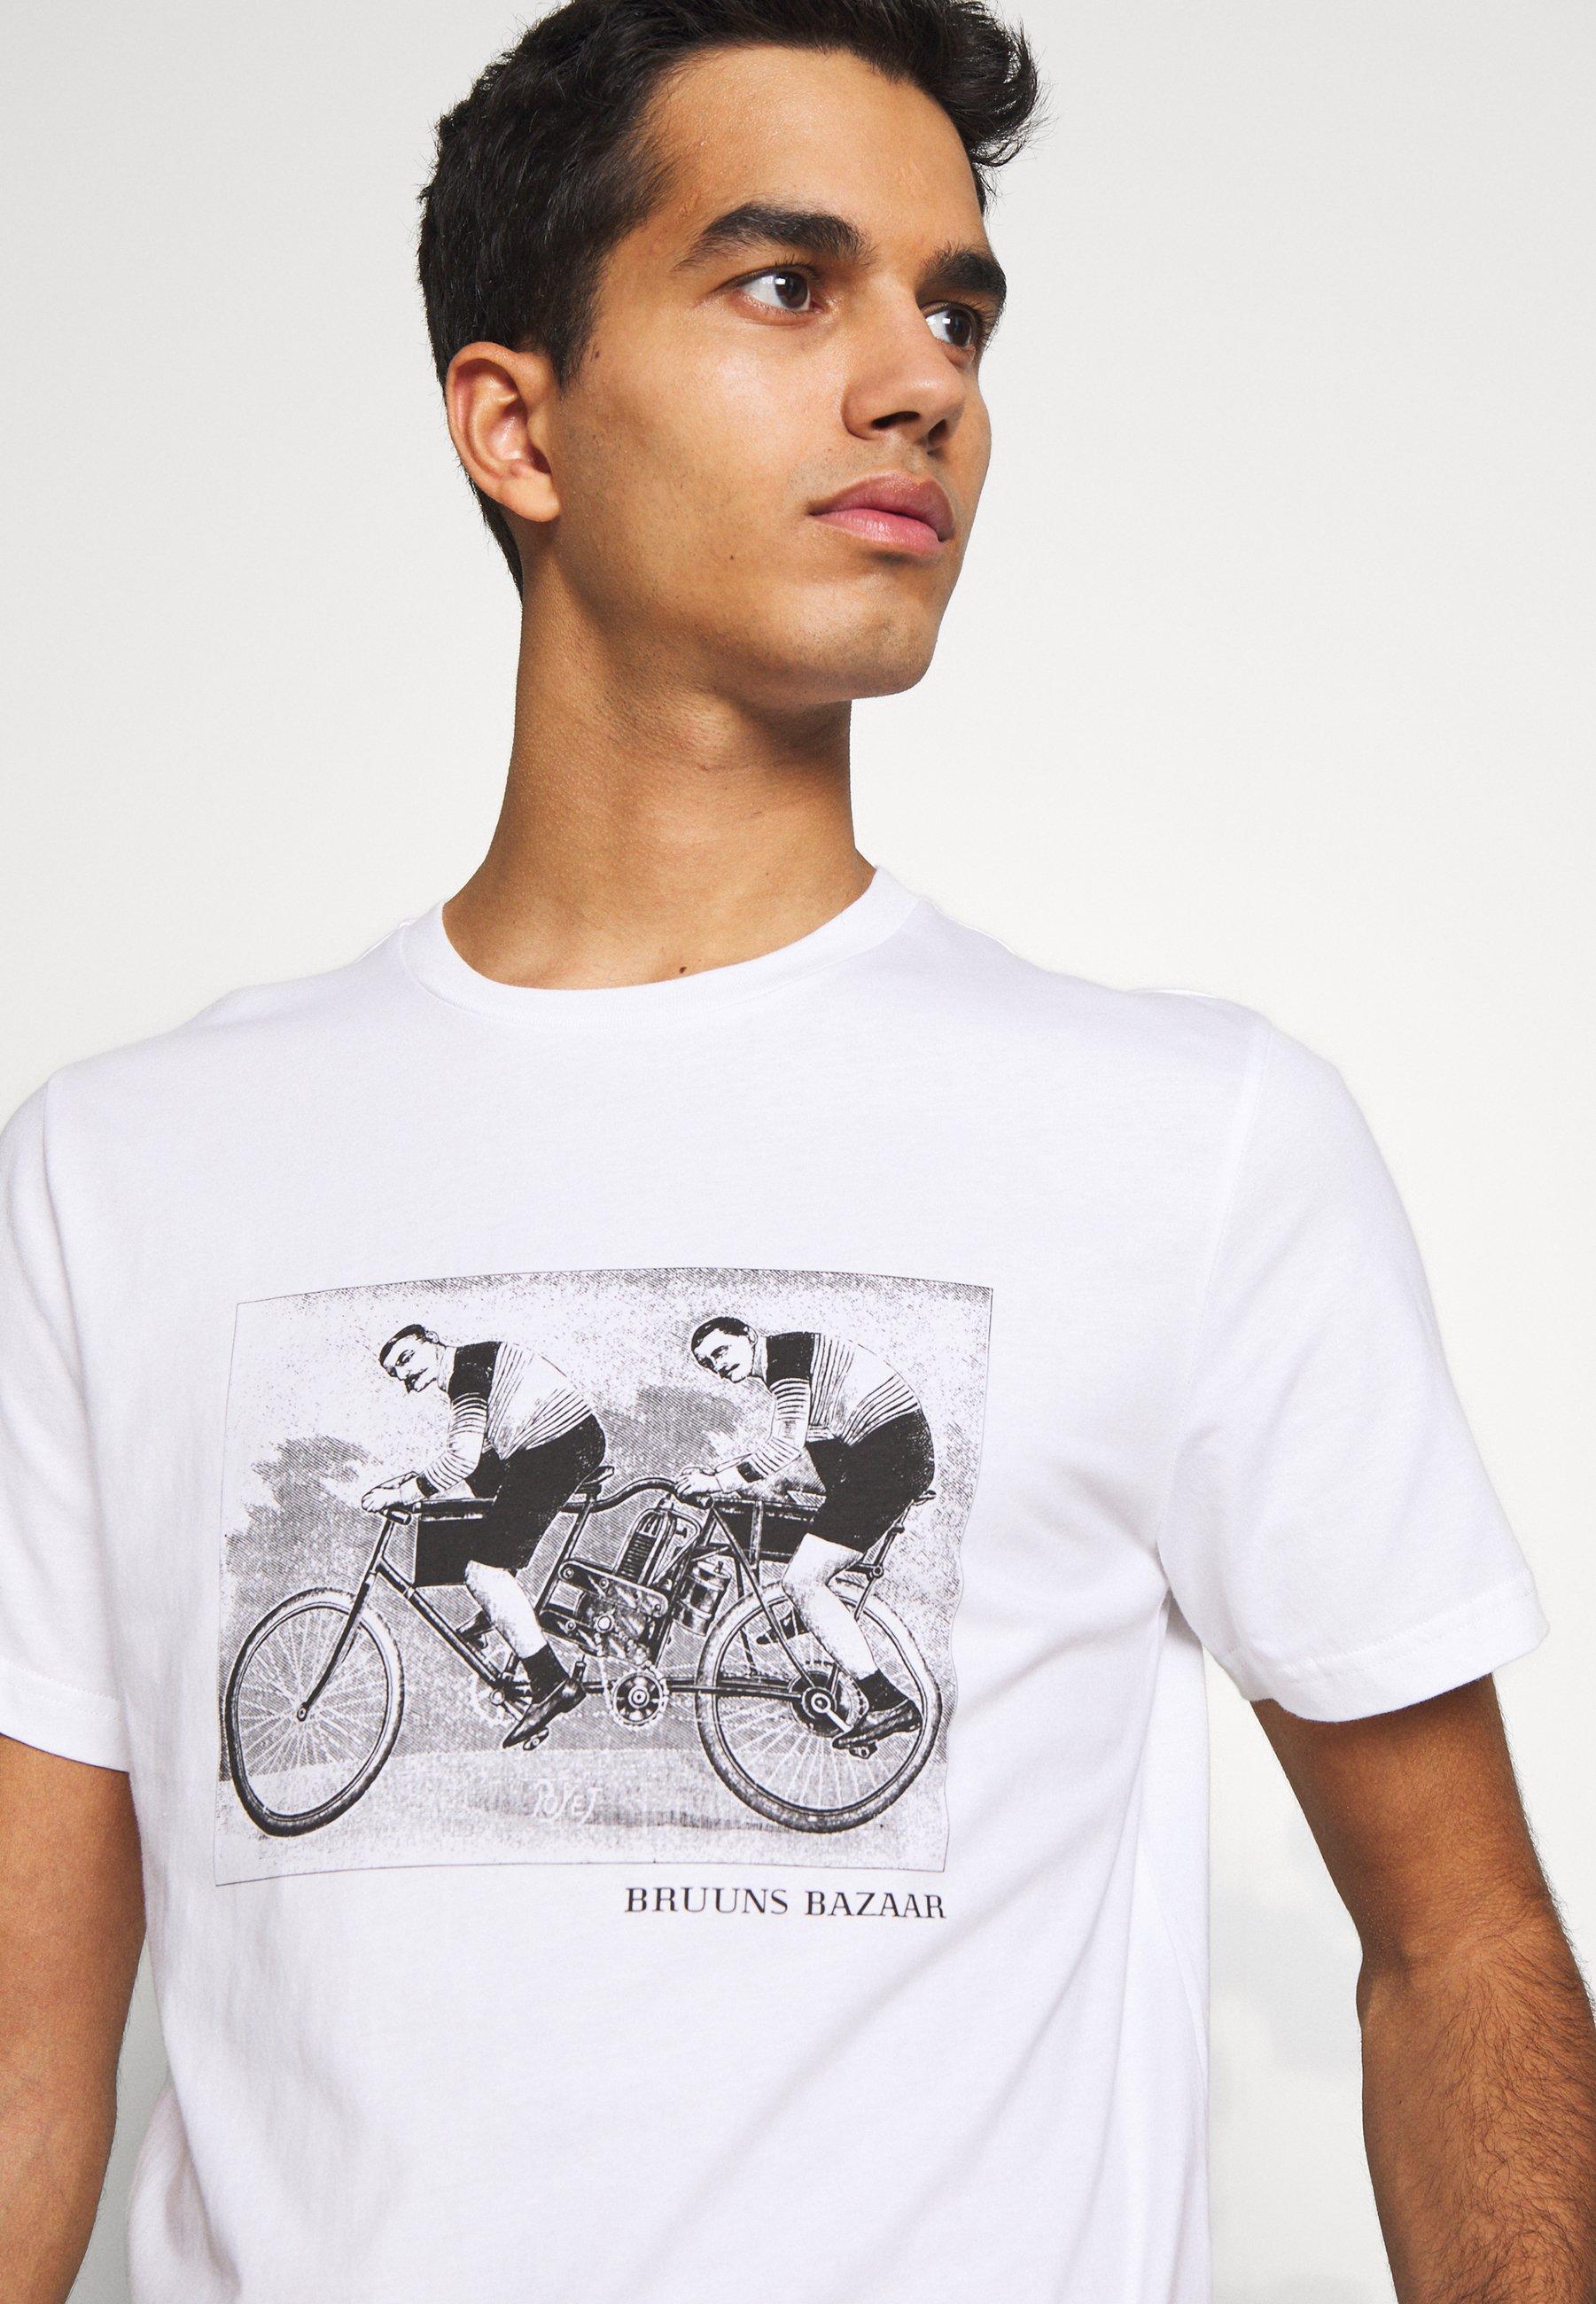 Bruuns Bazaar Leon Sylvester Tee - T-shirt Imprimé White 8v91u4U